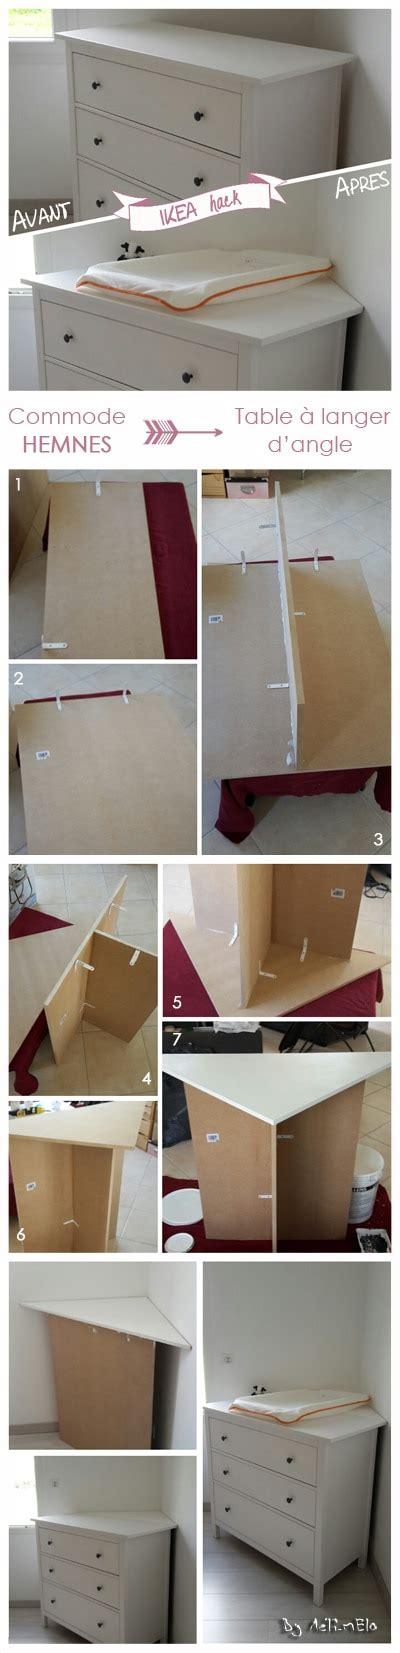 cr馥r sa chambre ikea table a langer dangle maison design wiblia com